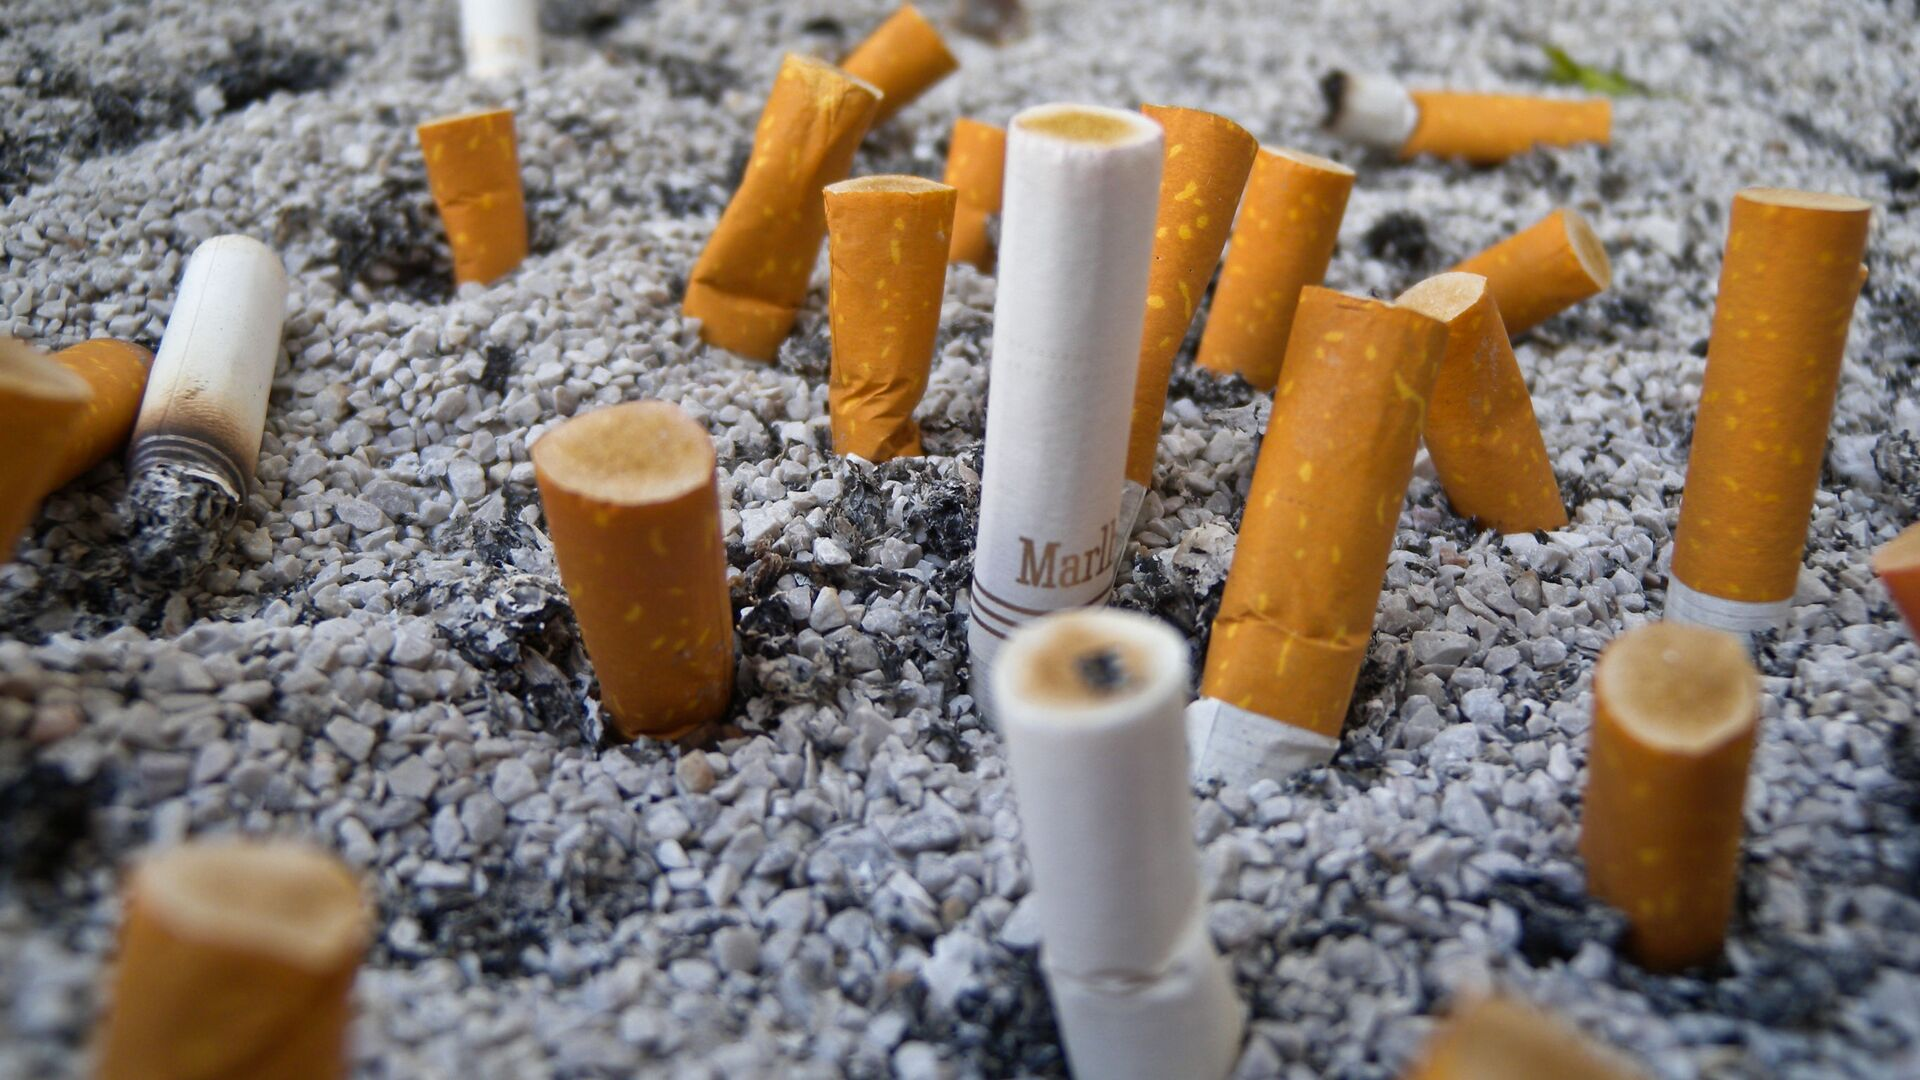 Sigarette - Sputnik Italia, 1920, 10.10.2021